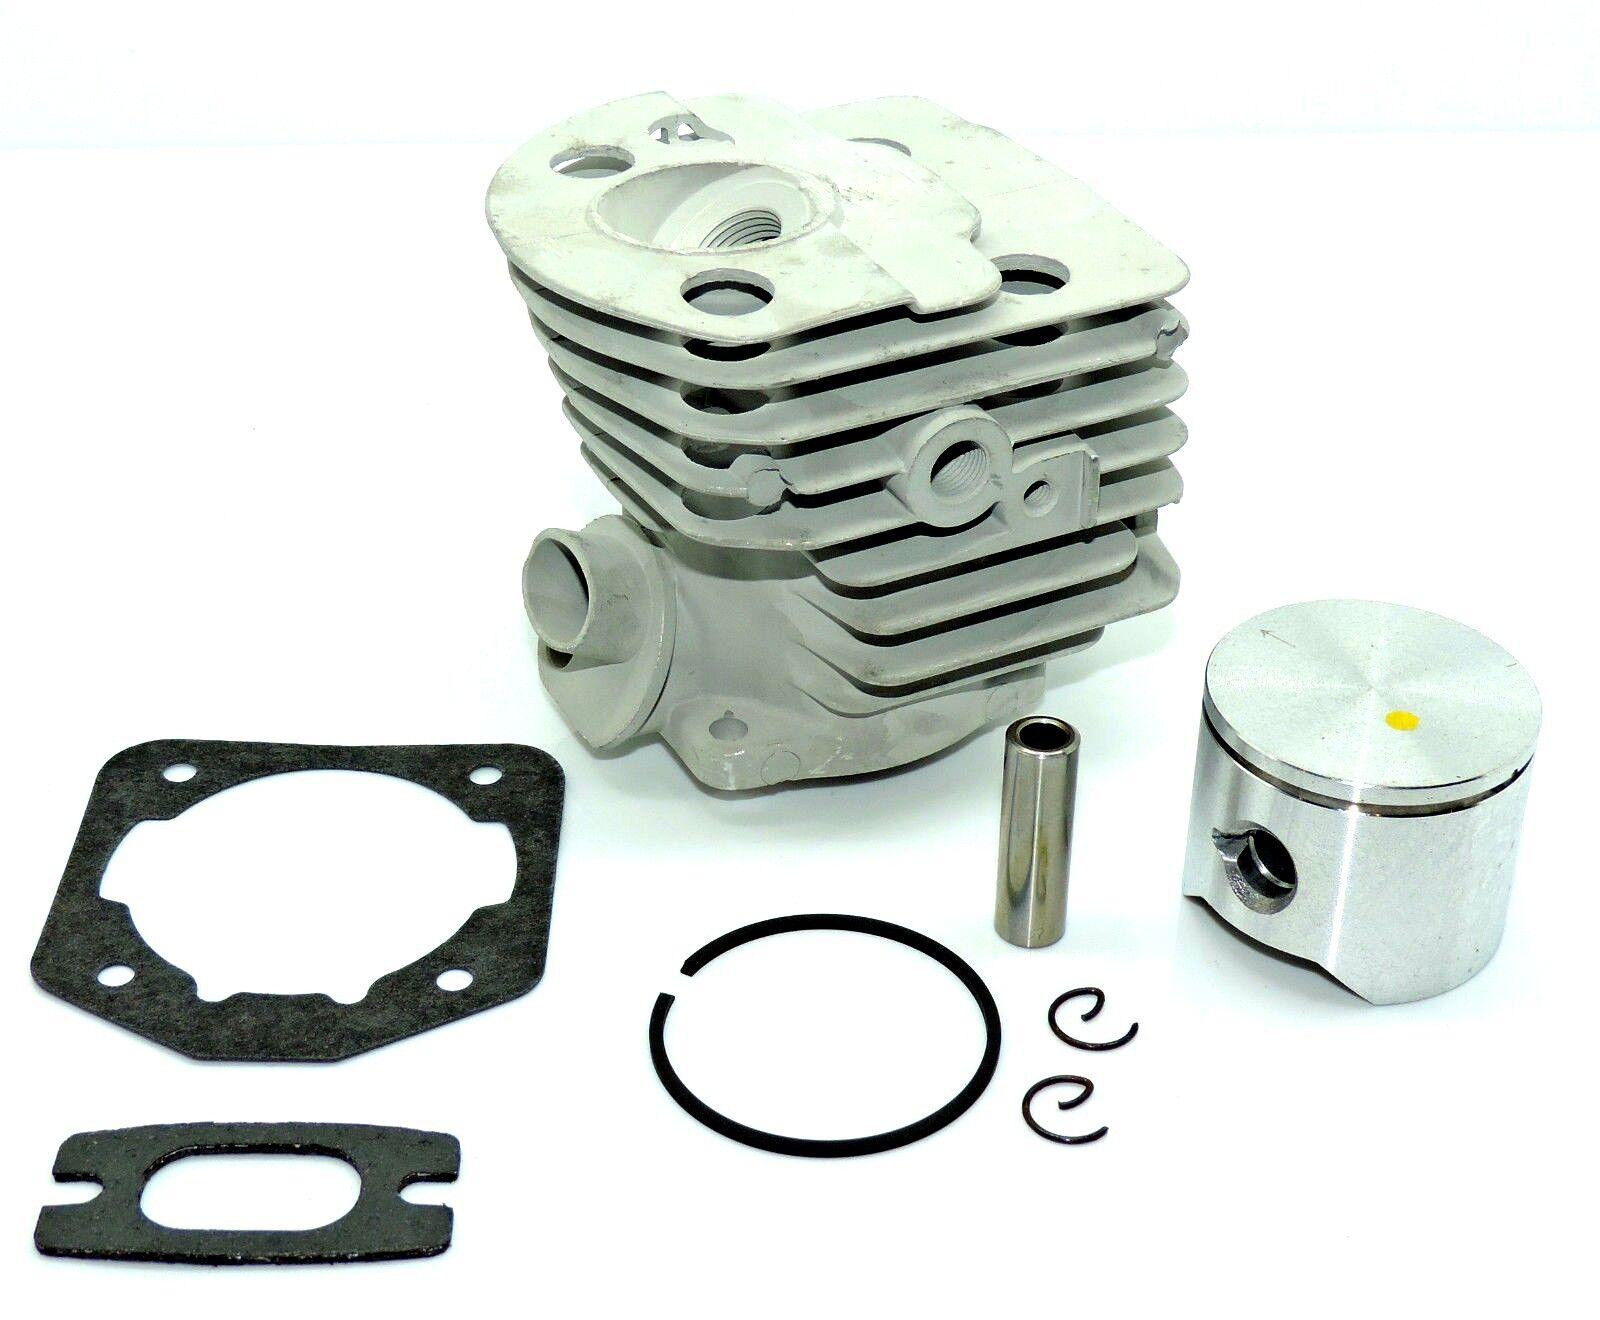 Zylinder & Kolben Set (46mm) Passend zu Husqvarna 51 55 Kettensägen 503 60 91 71